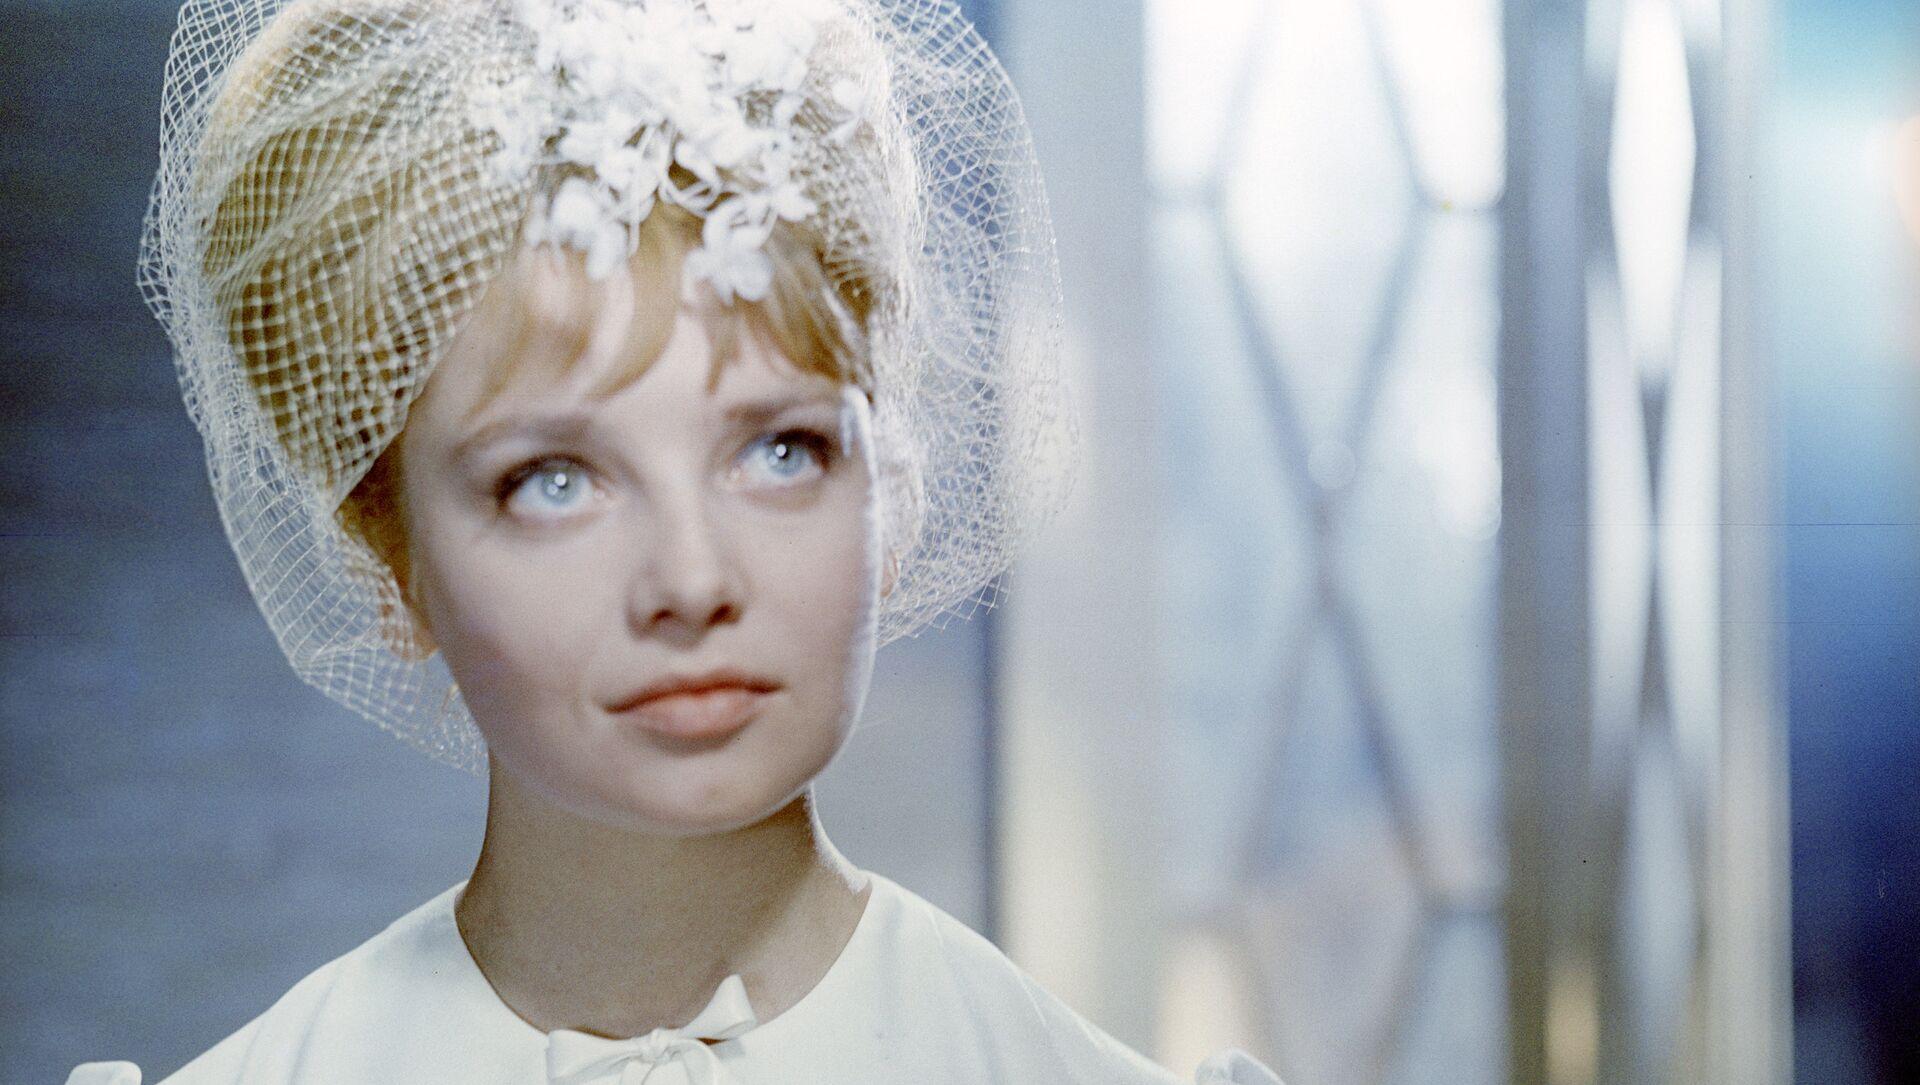 Natalia Kustínskaya, actriz soviética de los años 60 - Sputnik Mundo, 1920, 06.03.2017